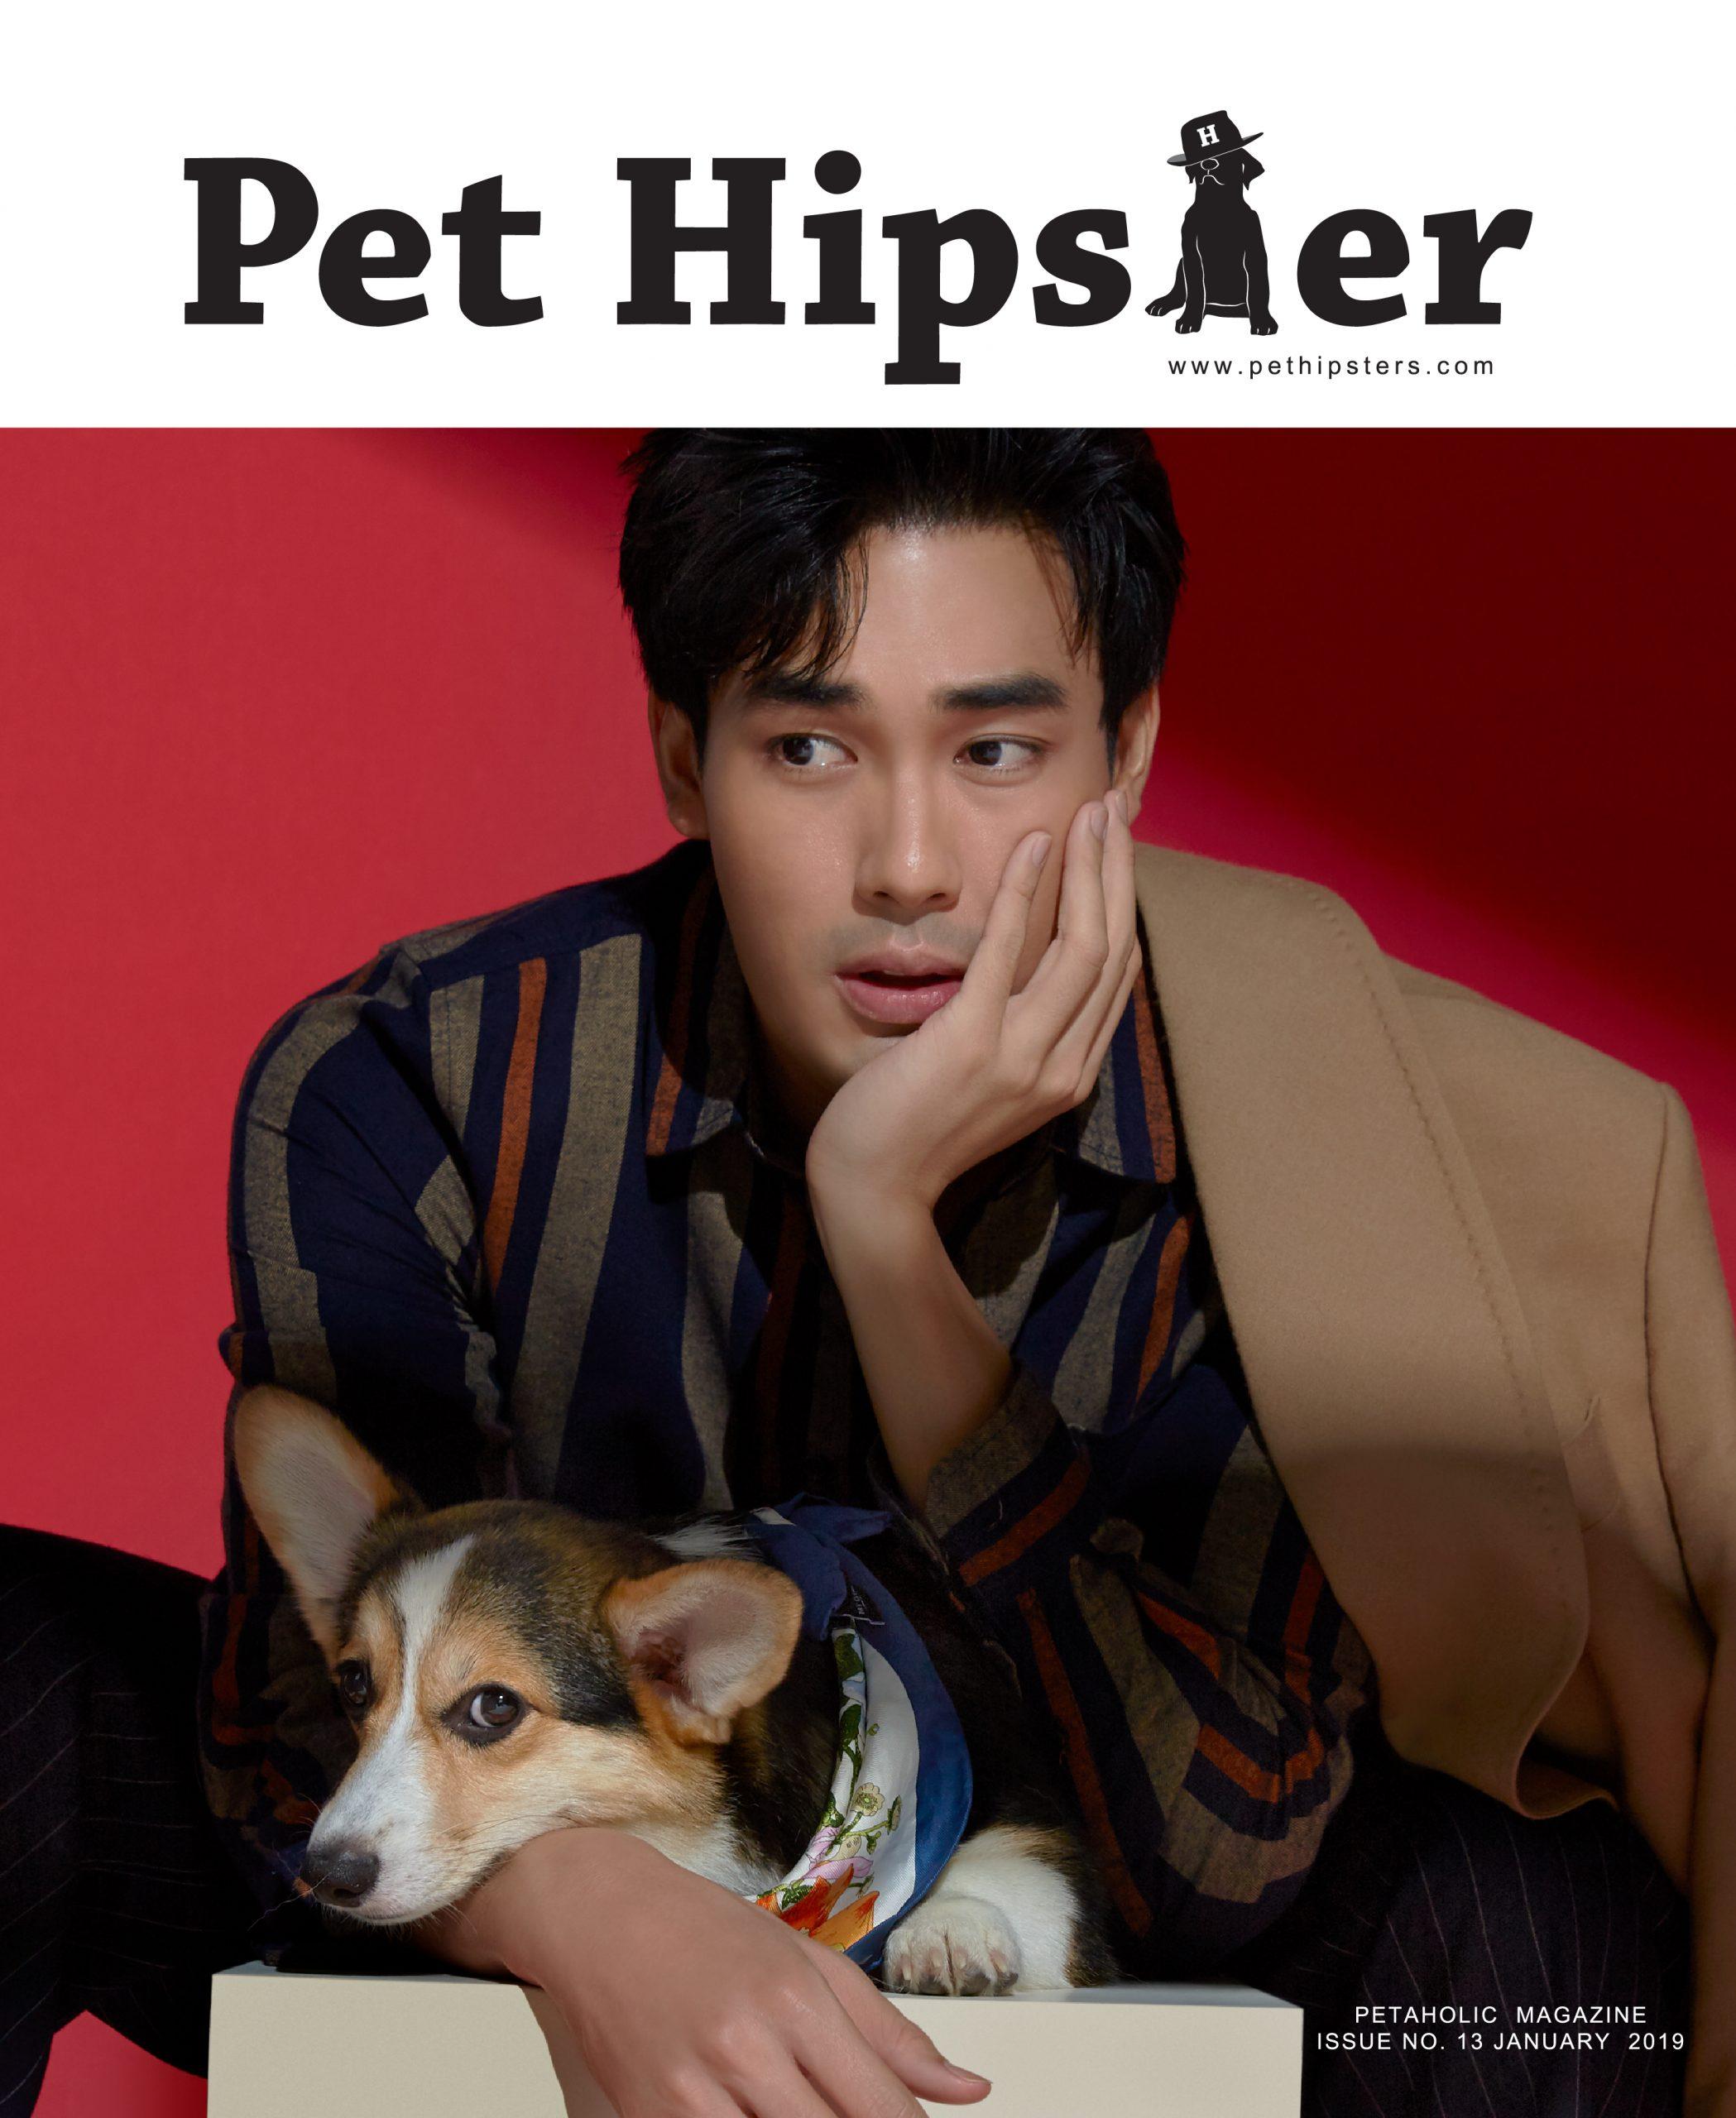 Pet Hipster